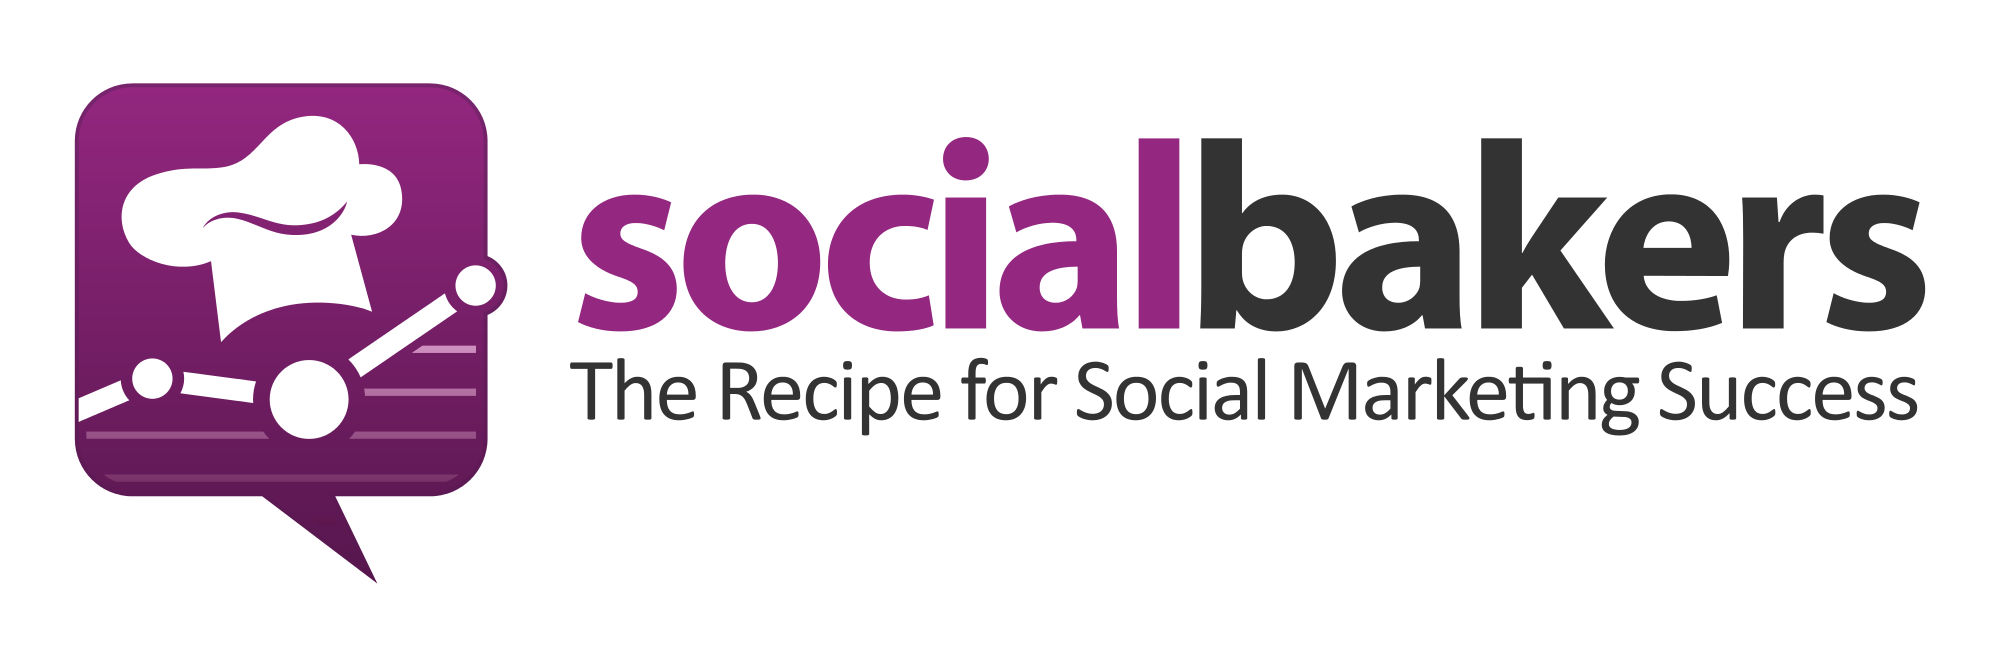 socialbakers Marken Facebook